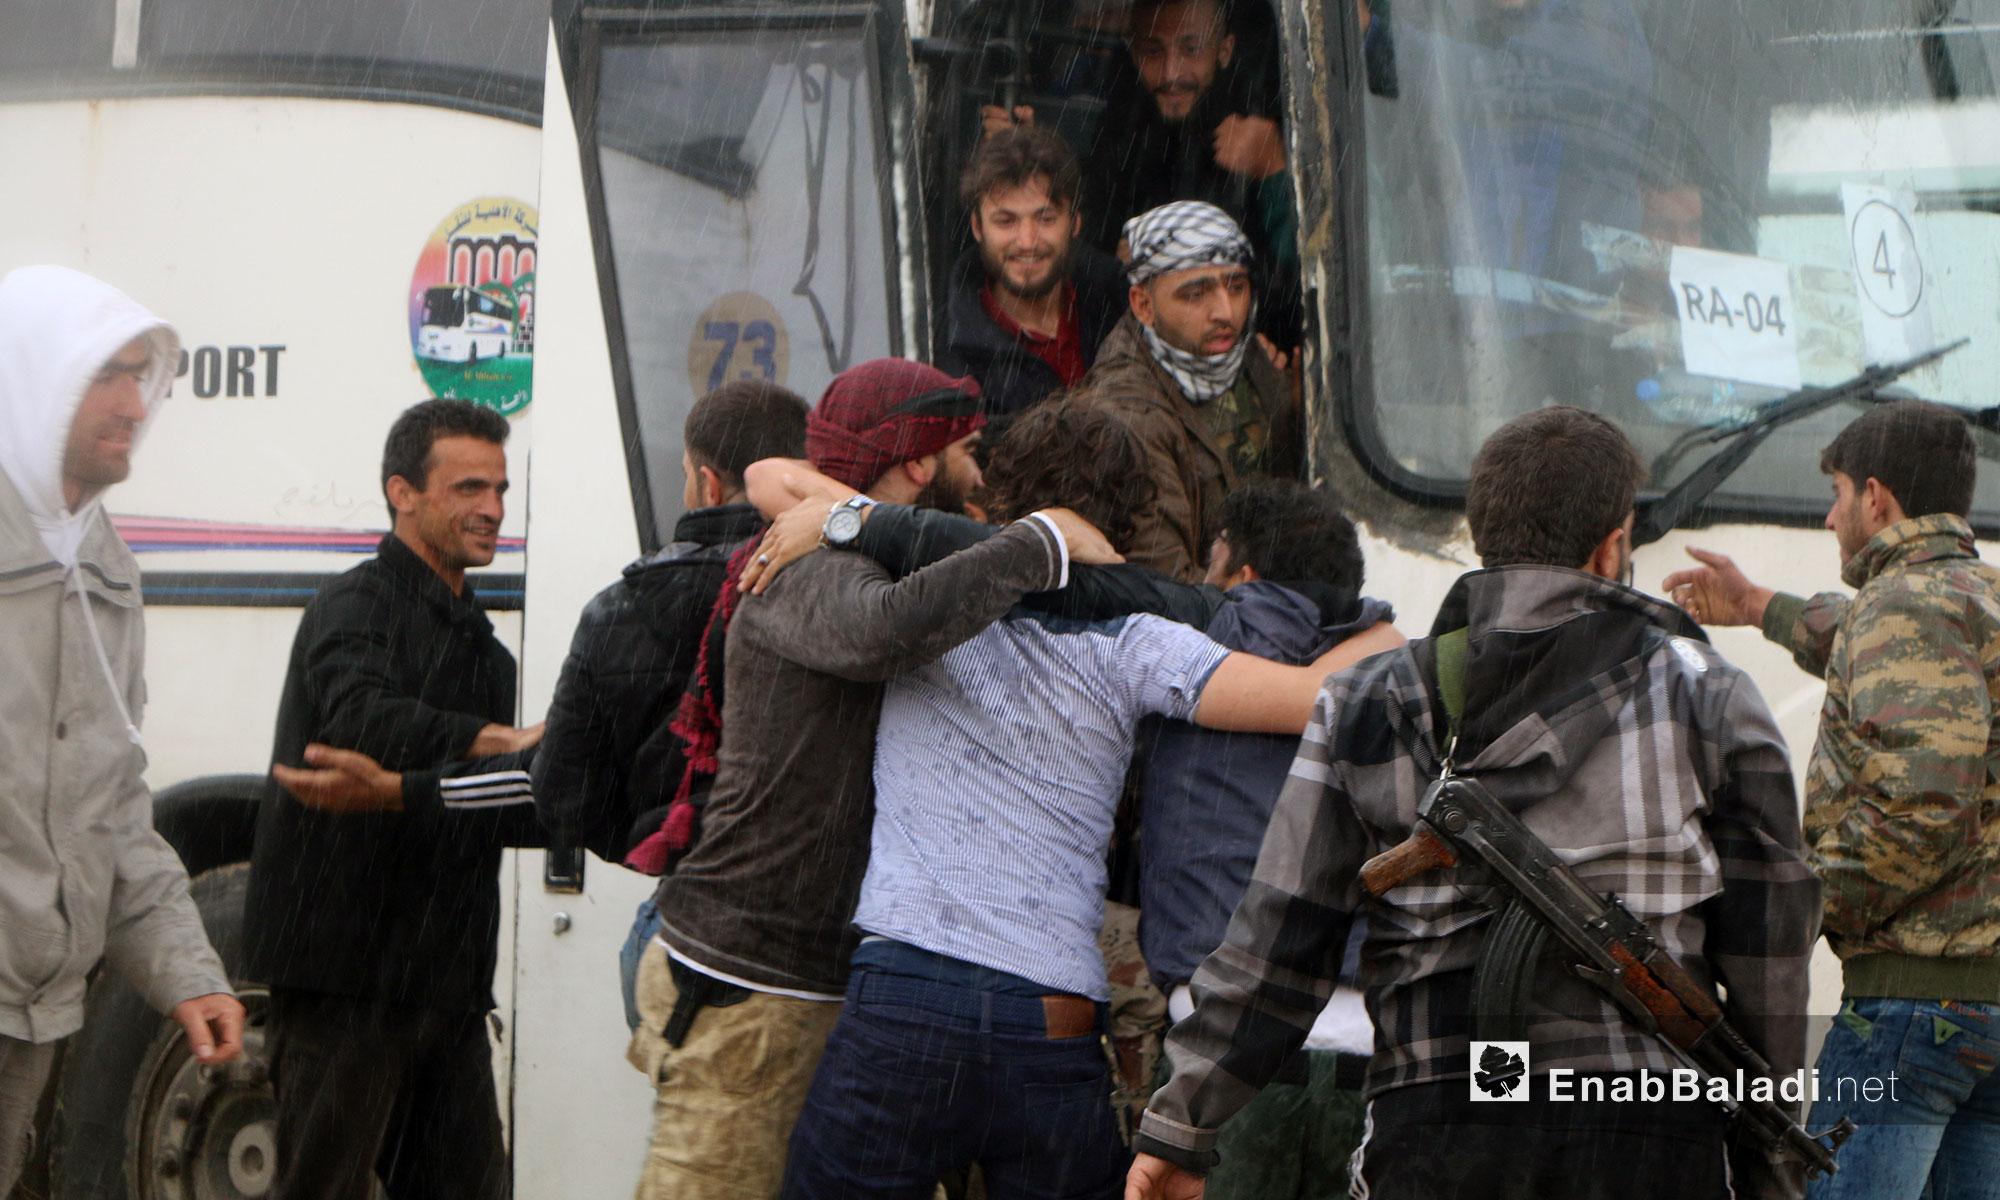 Homs IDPs reach al-Zendain crossing in the city of al-Bab in eastern Aleppo – May 9. 2018 (Enab Baladi)